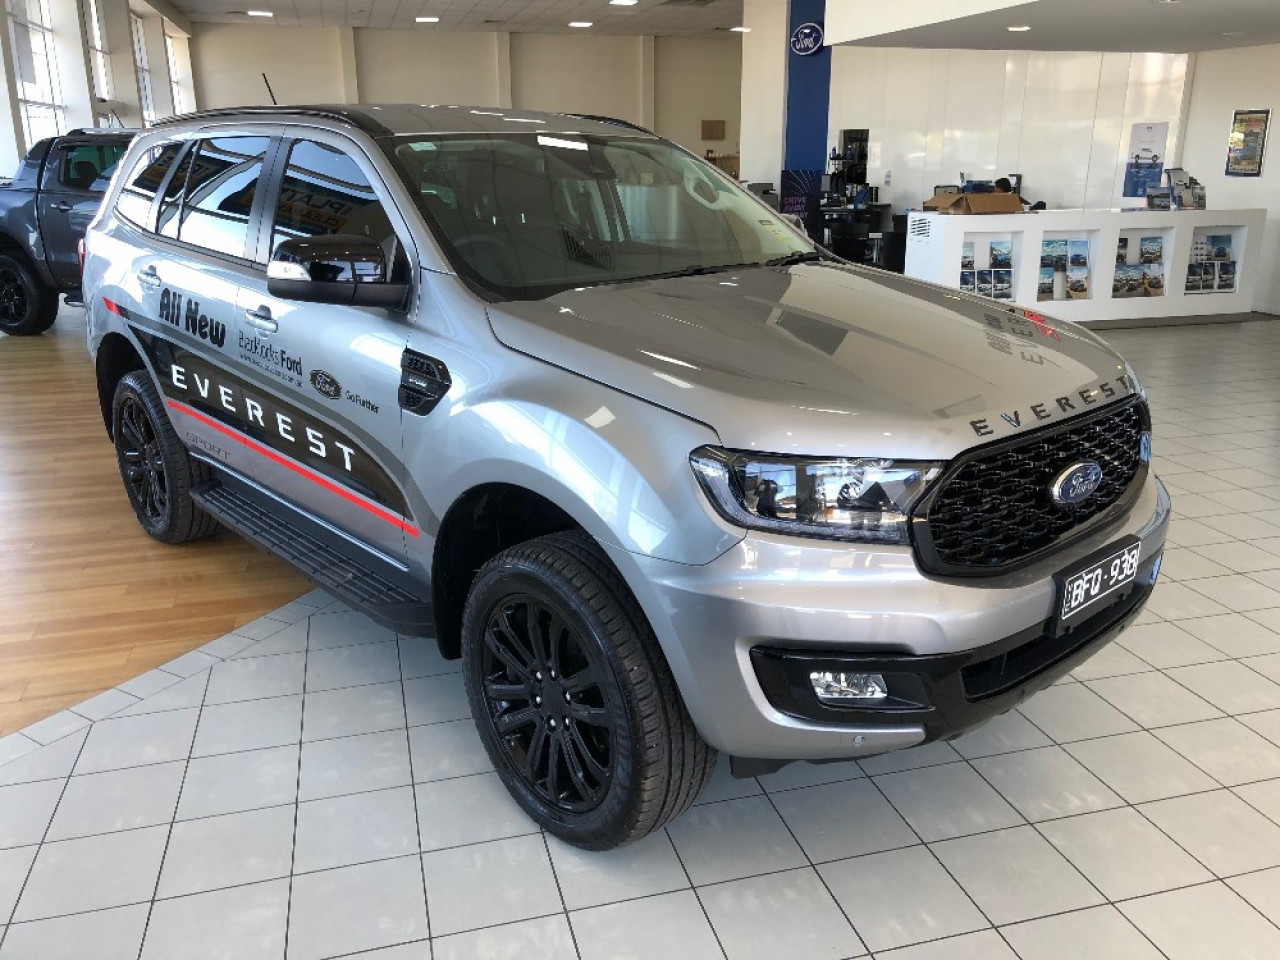 2019 MY20.25 Ford Everest UAII Sport Suv